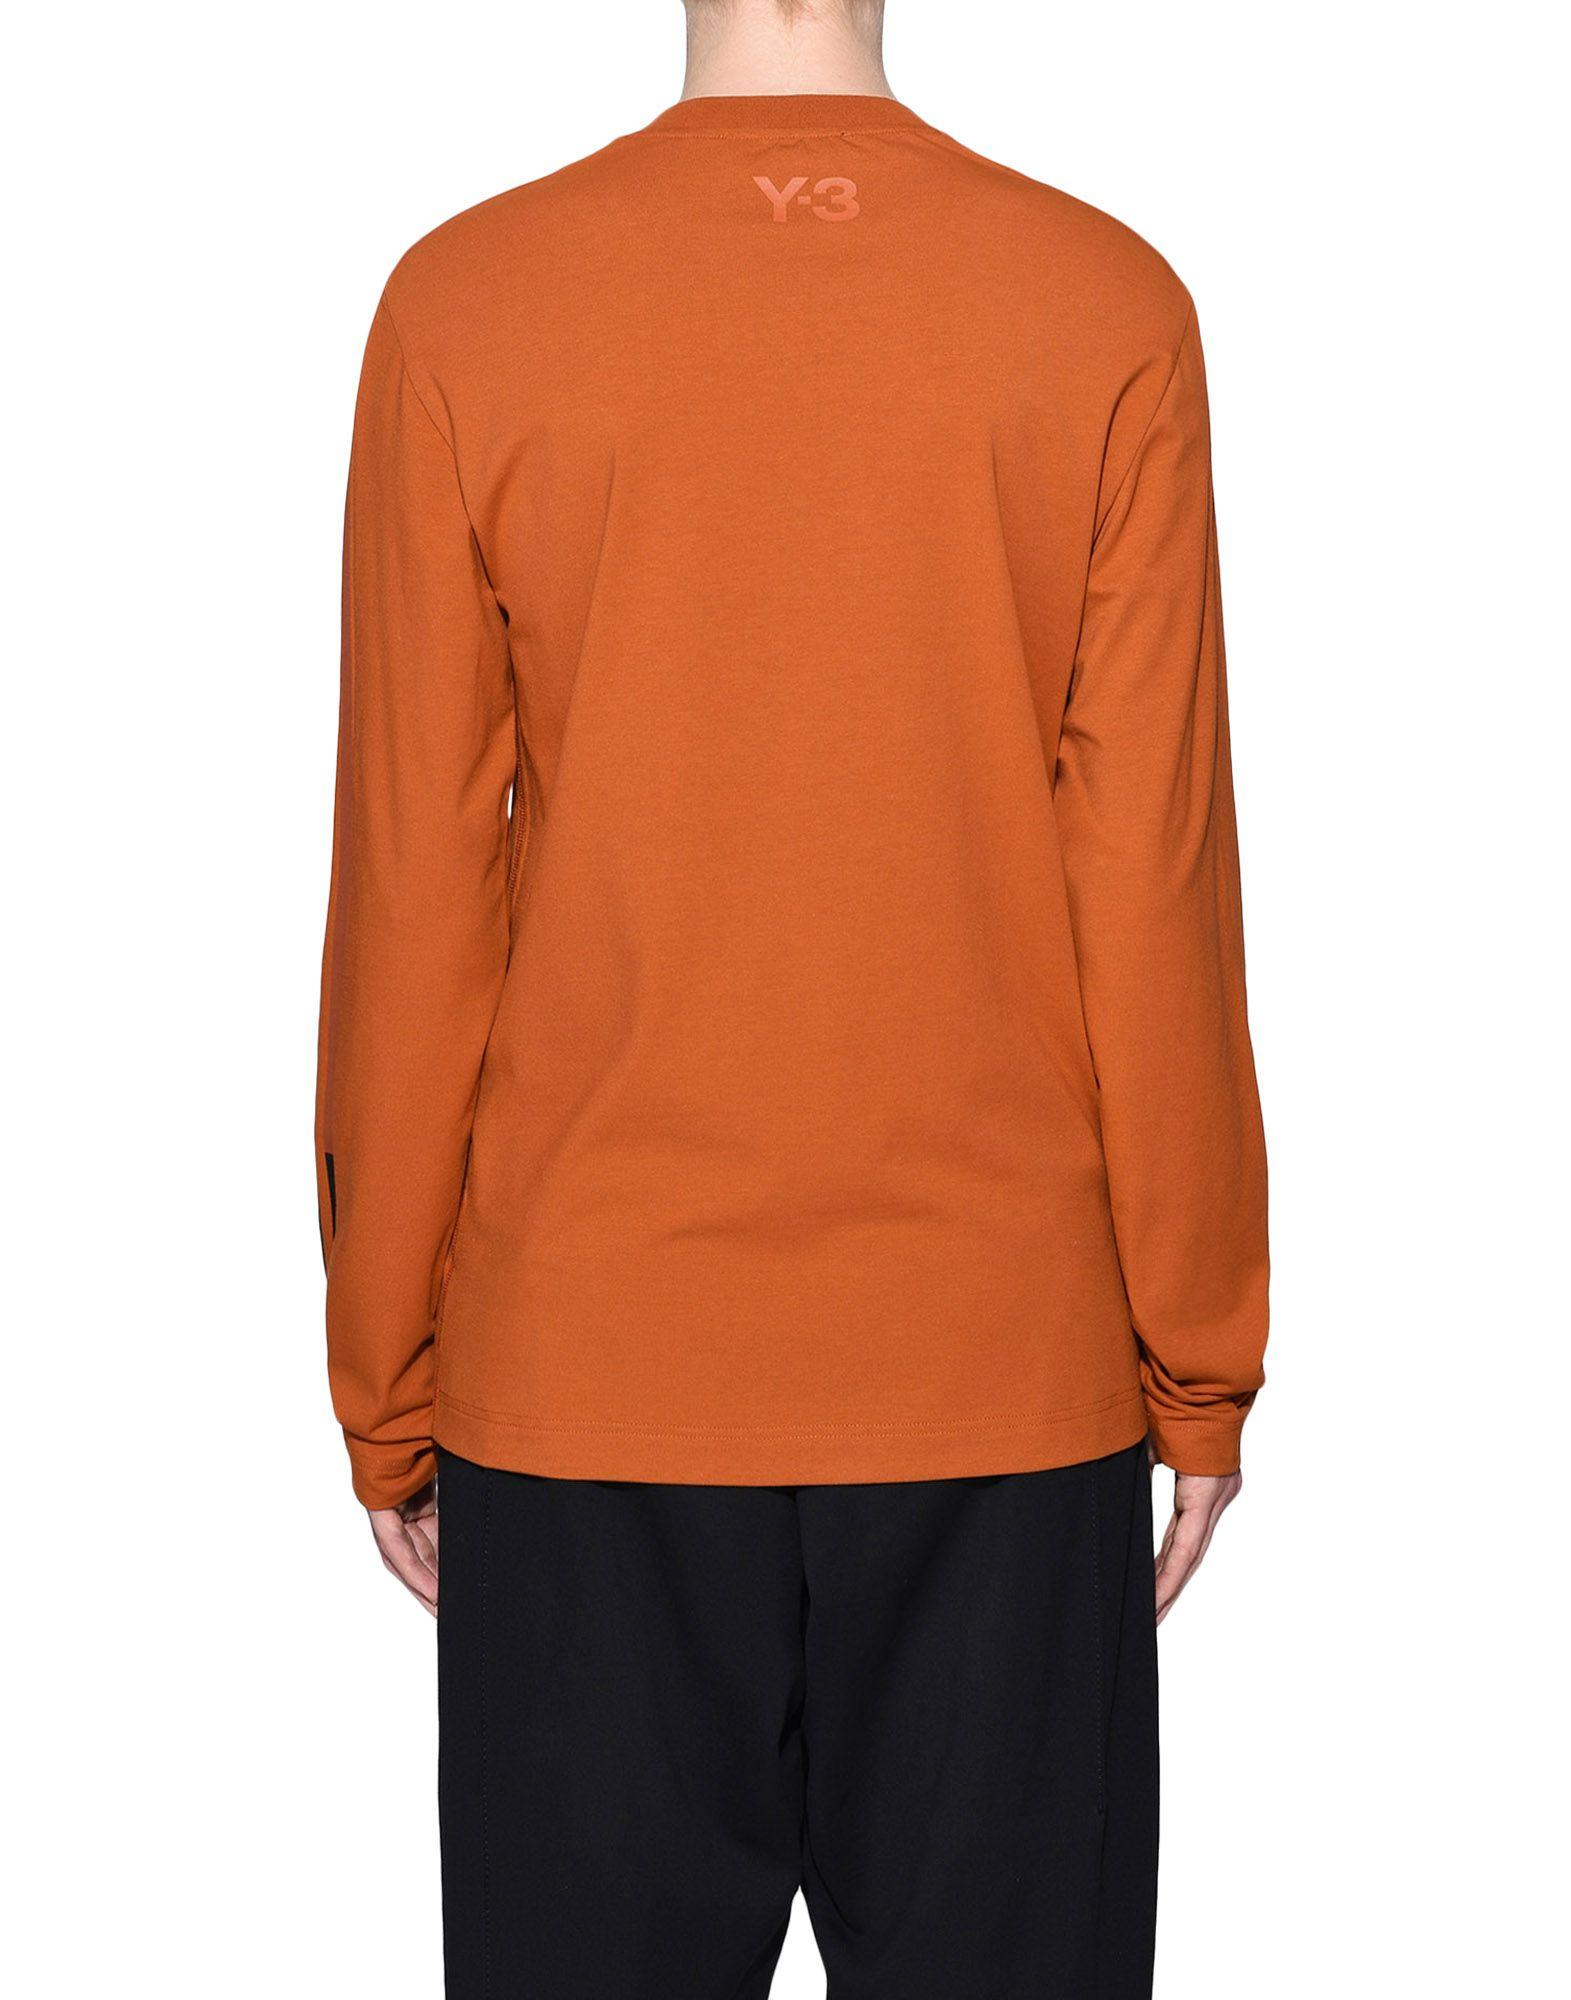 Y-3 Y-3 3-Stripes Tee Long sleeve t-shirt Woman d